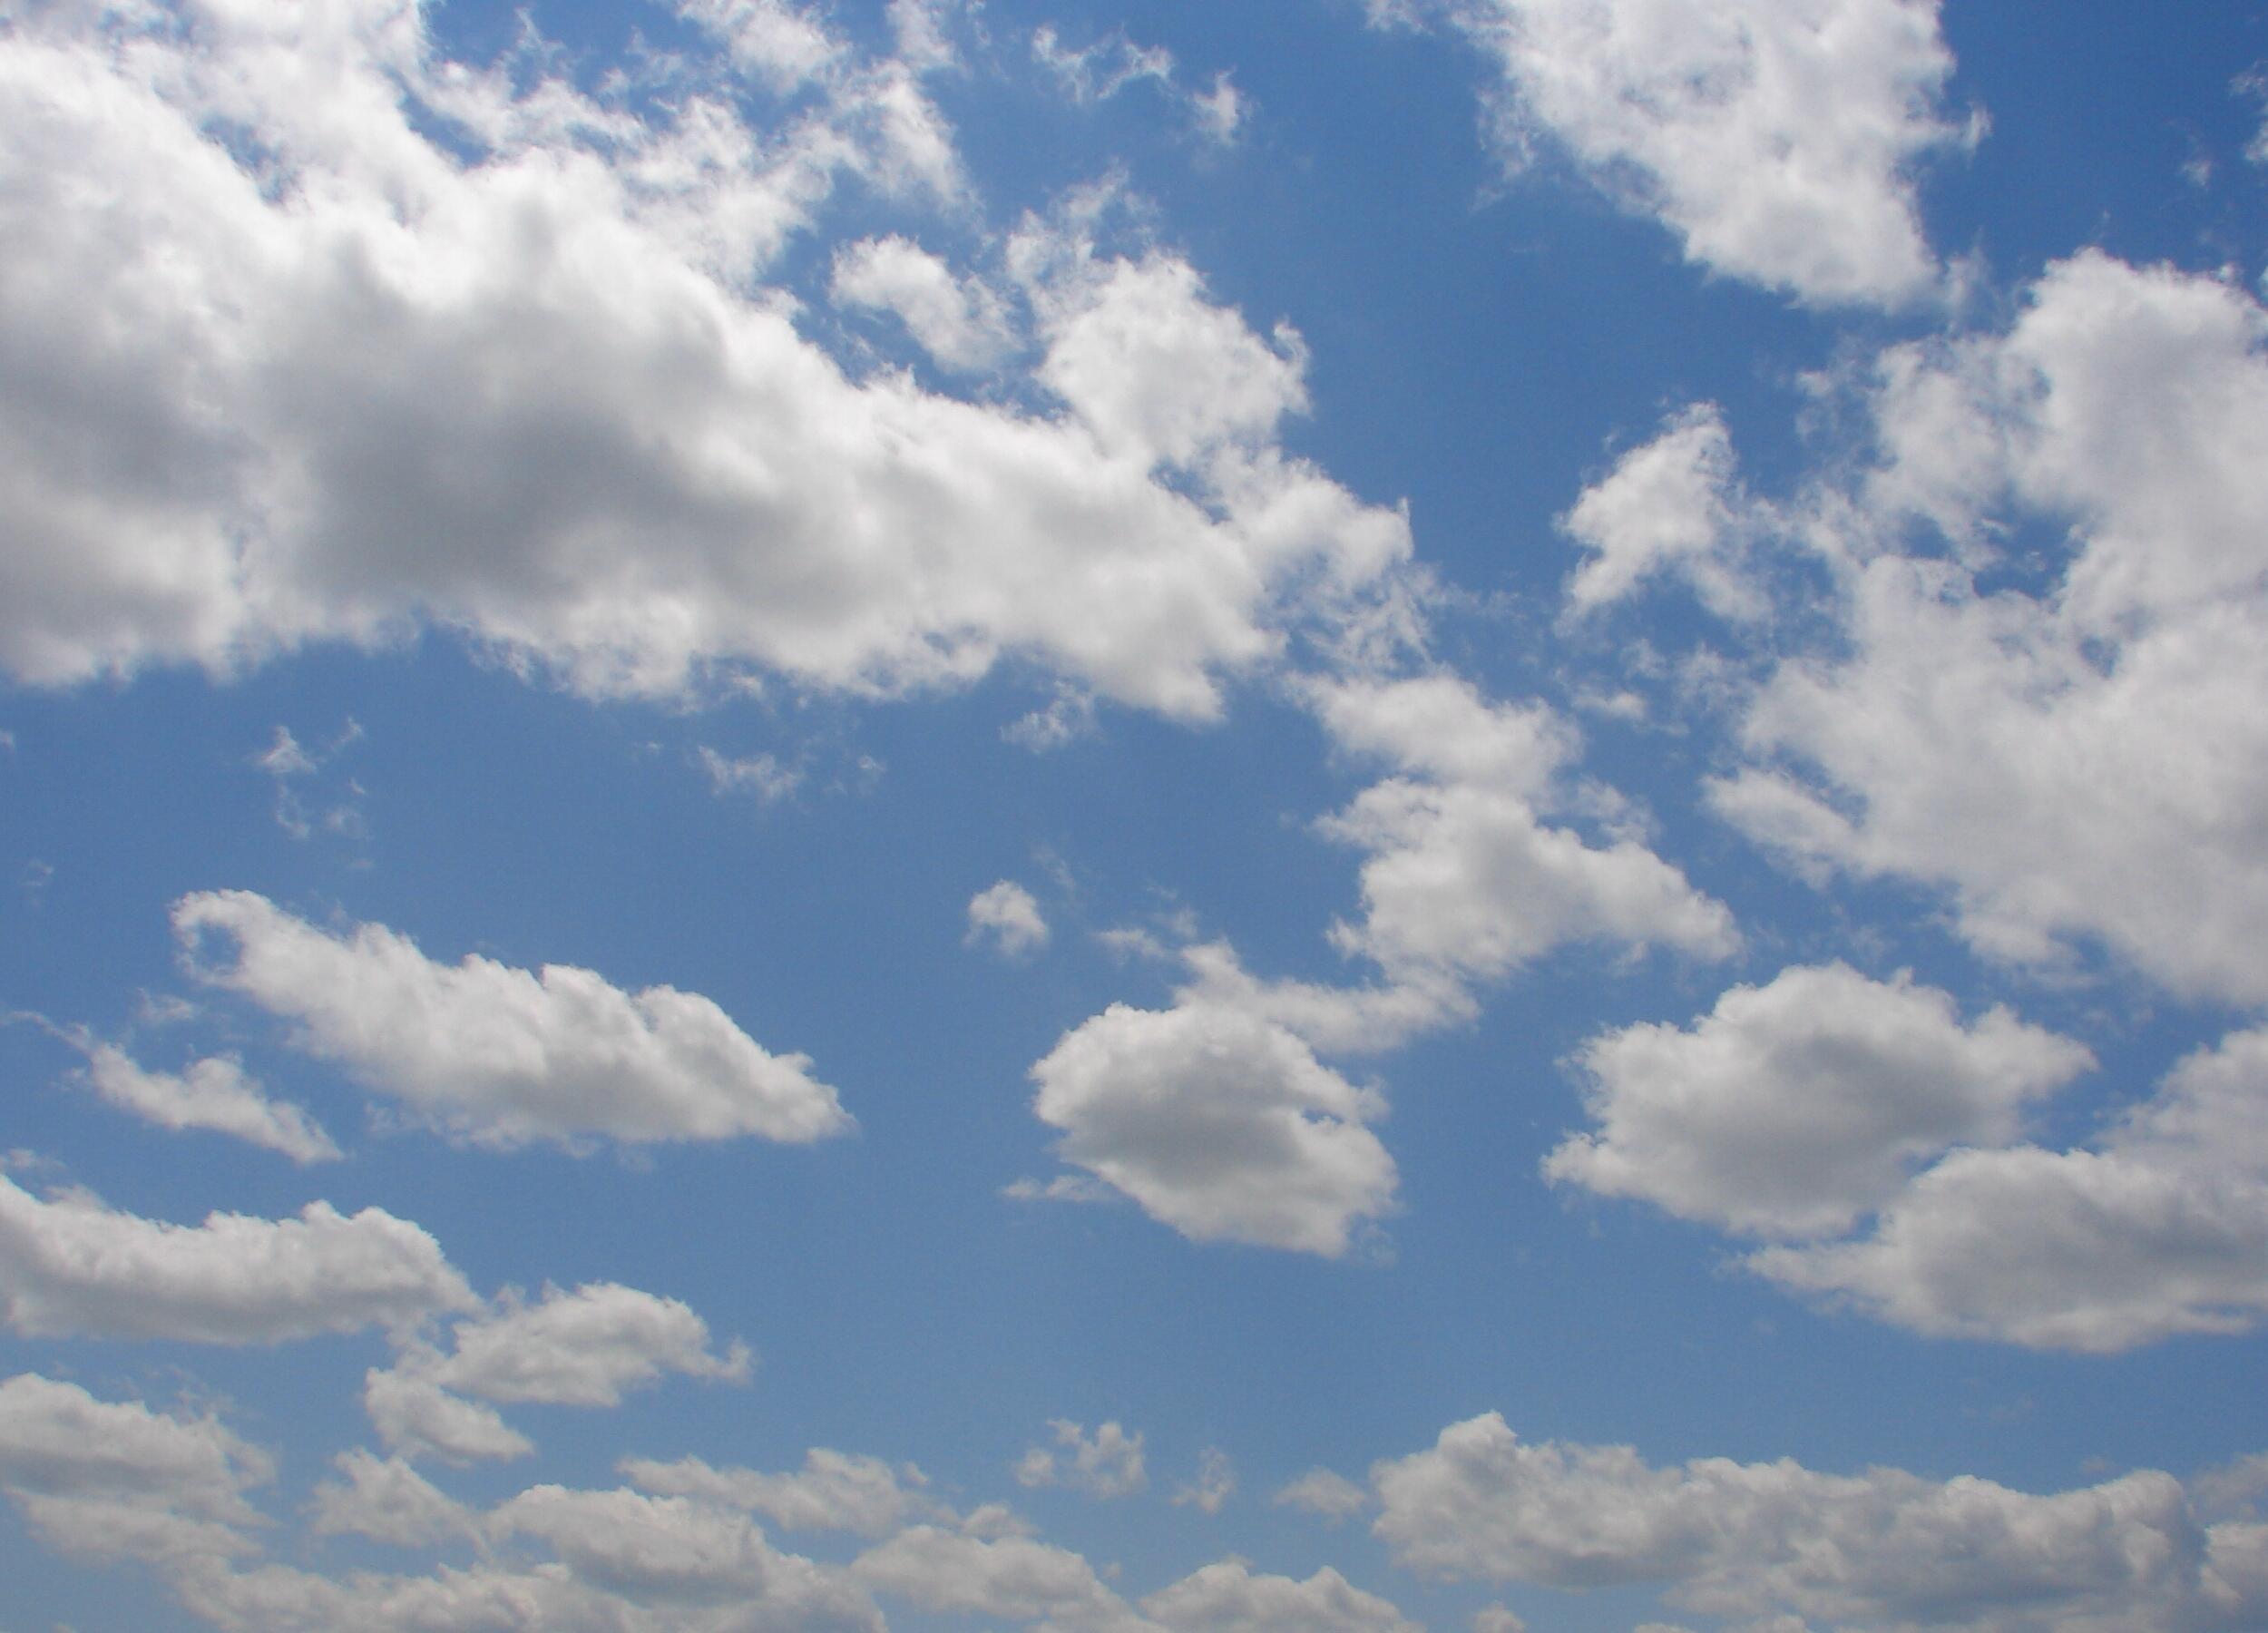 Wild Blue Yonder Sky Clouds 14 By FantasyStock On DeviantArt